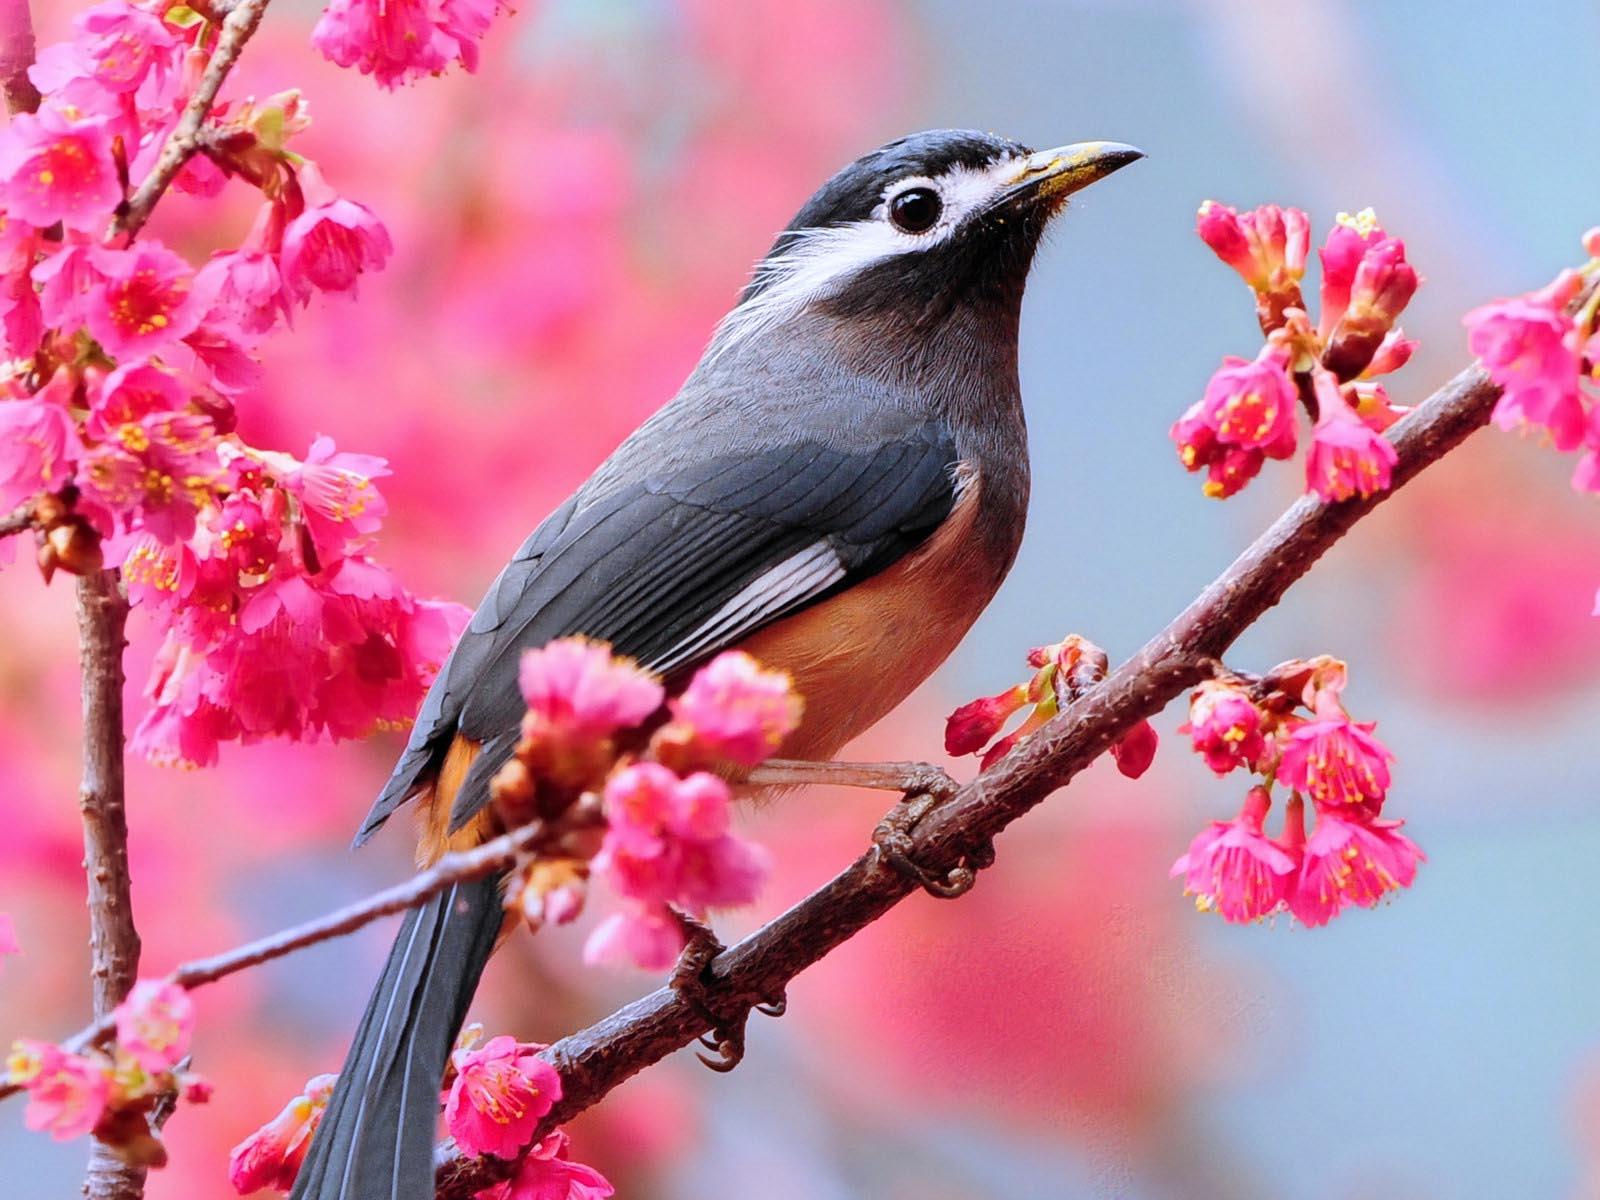 http://3.bp.blogspot.com/-ONQjH48lGnU/TnMI39Kr1xI/AAAAAAAAAHA/wT53mPUgbmk/s1600/1270087720_1600x1200_spring-bird-wallpaper.jpg